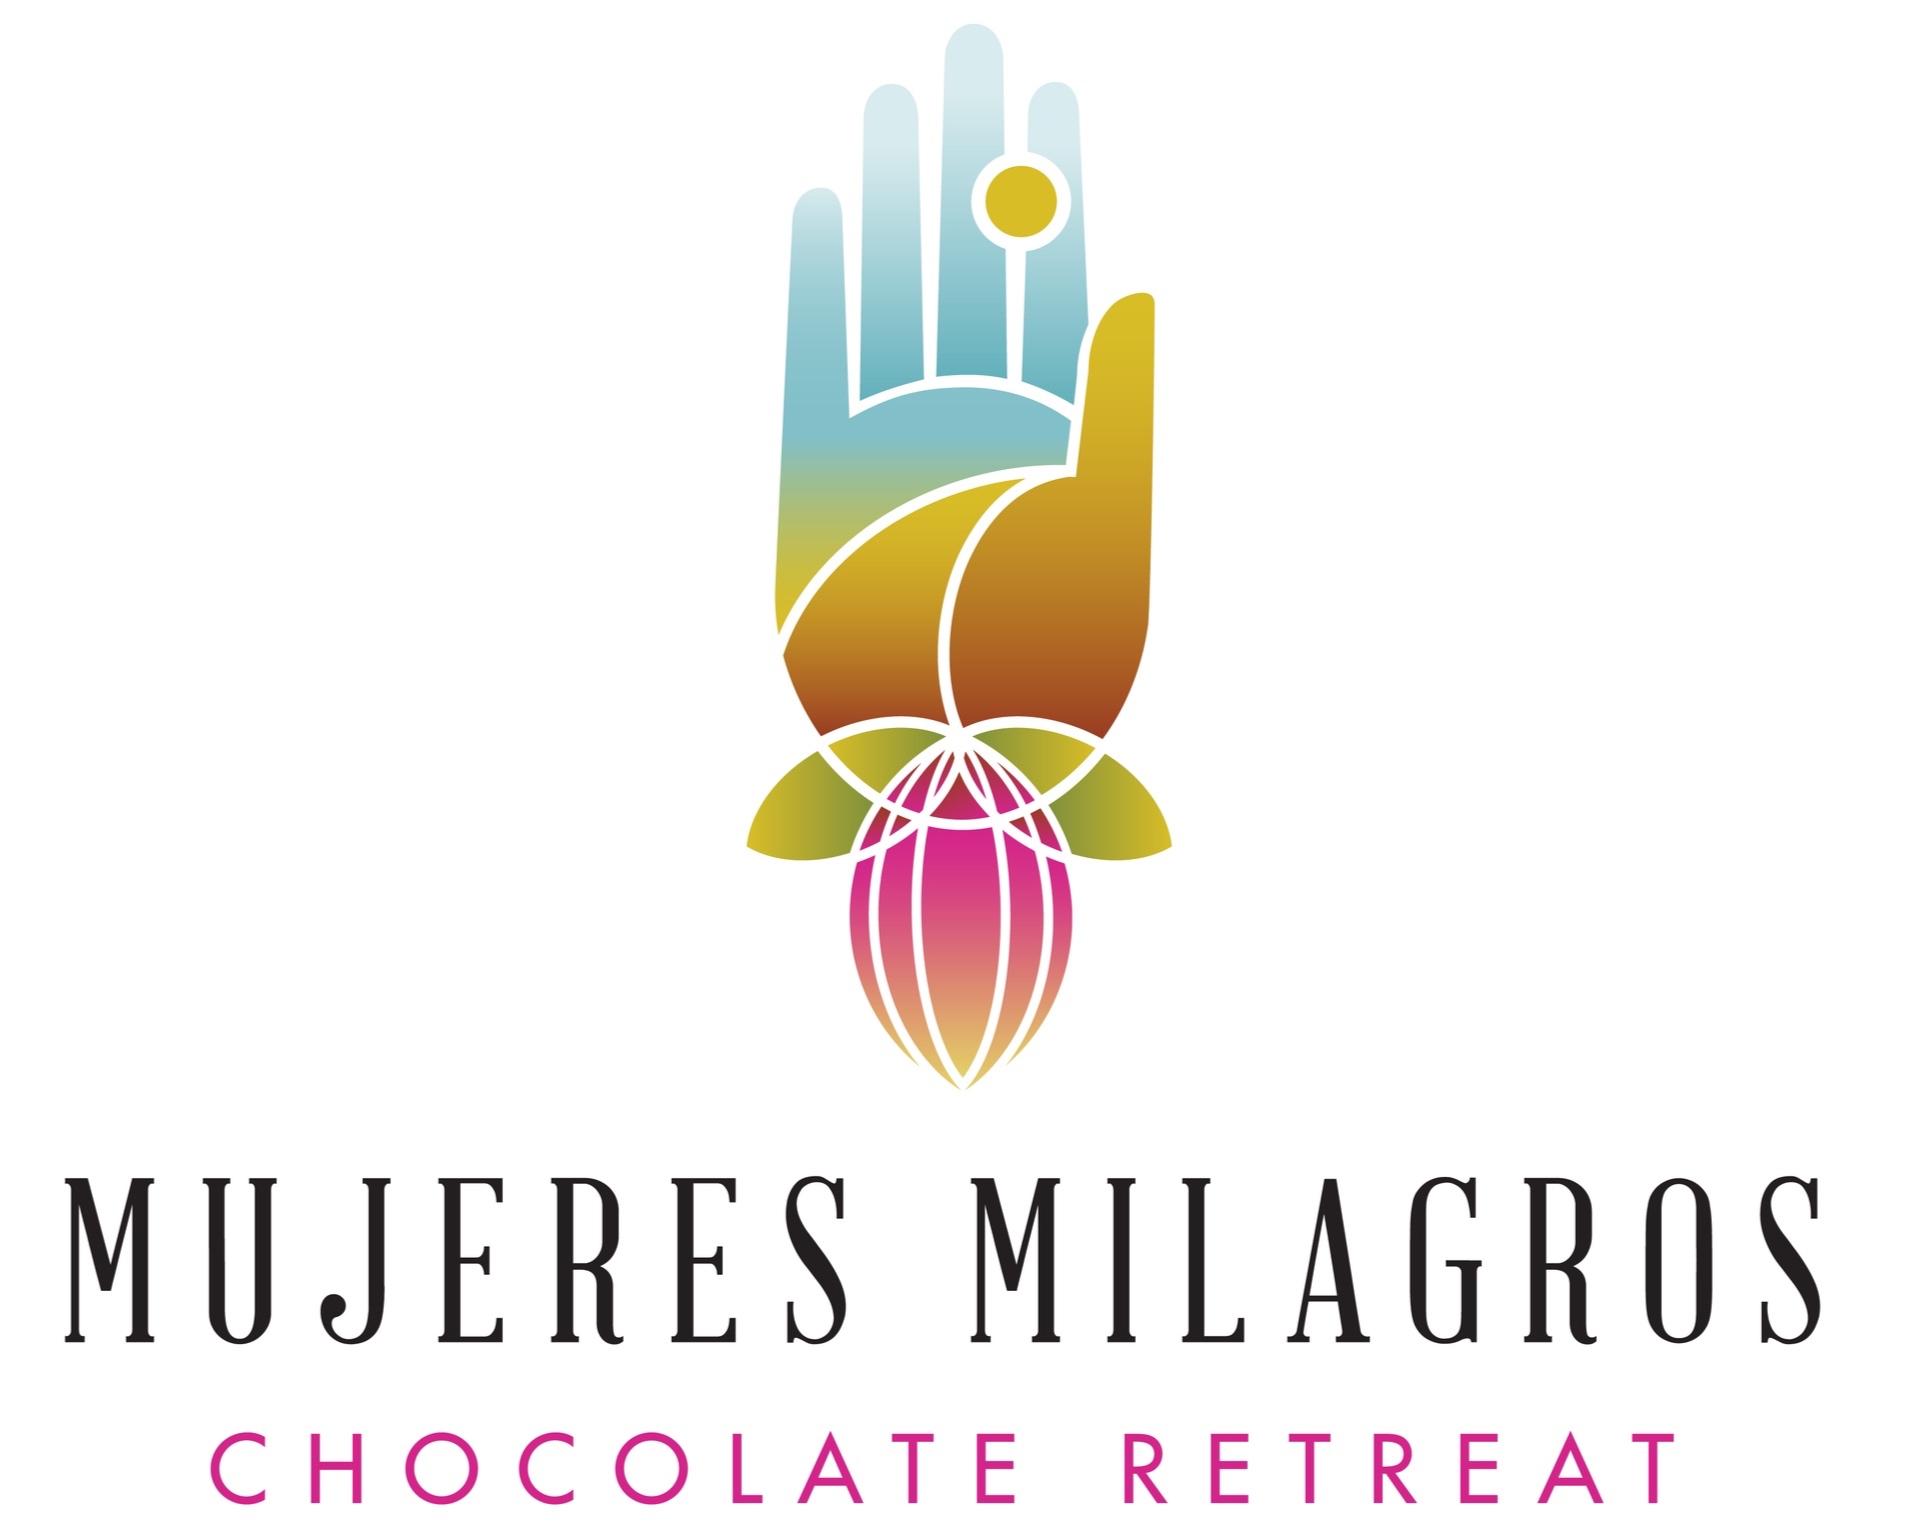 MujeresMilagros-santafe.jpg